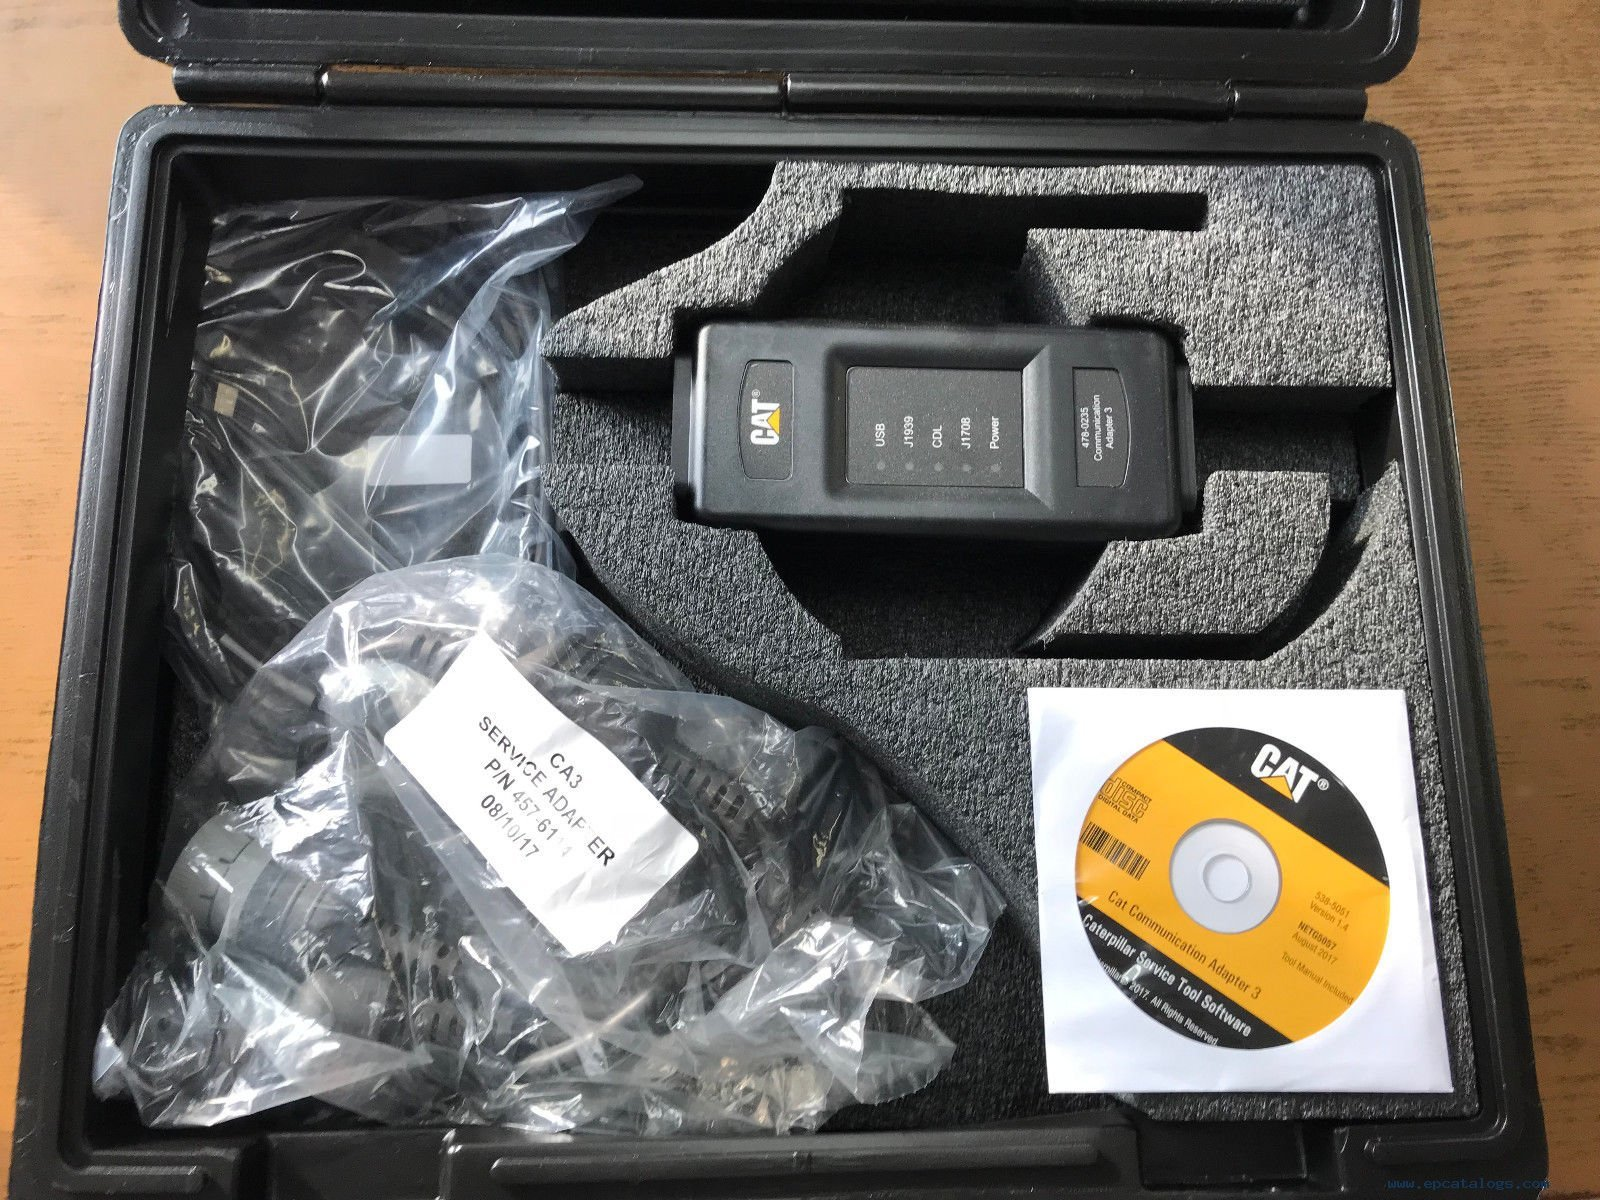 Caterpillar Communication Adapter III Kit PN 538-5051 (Replaces 466-6258) +  CAT ET 2019A